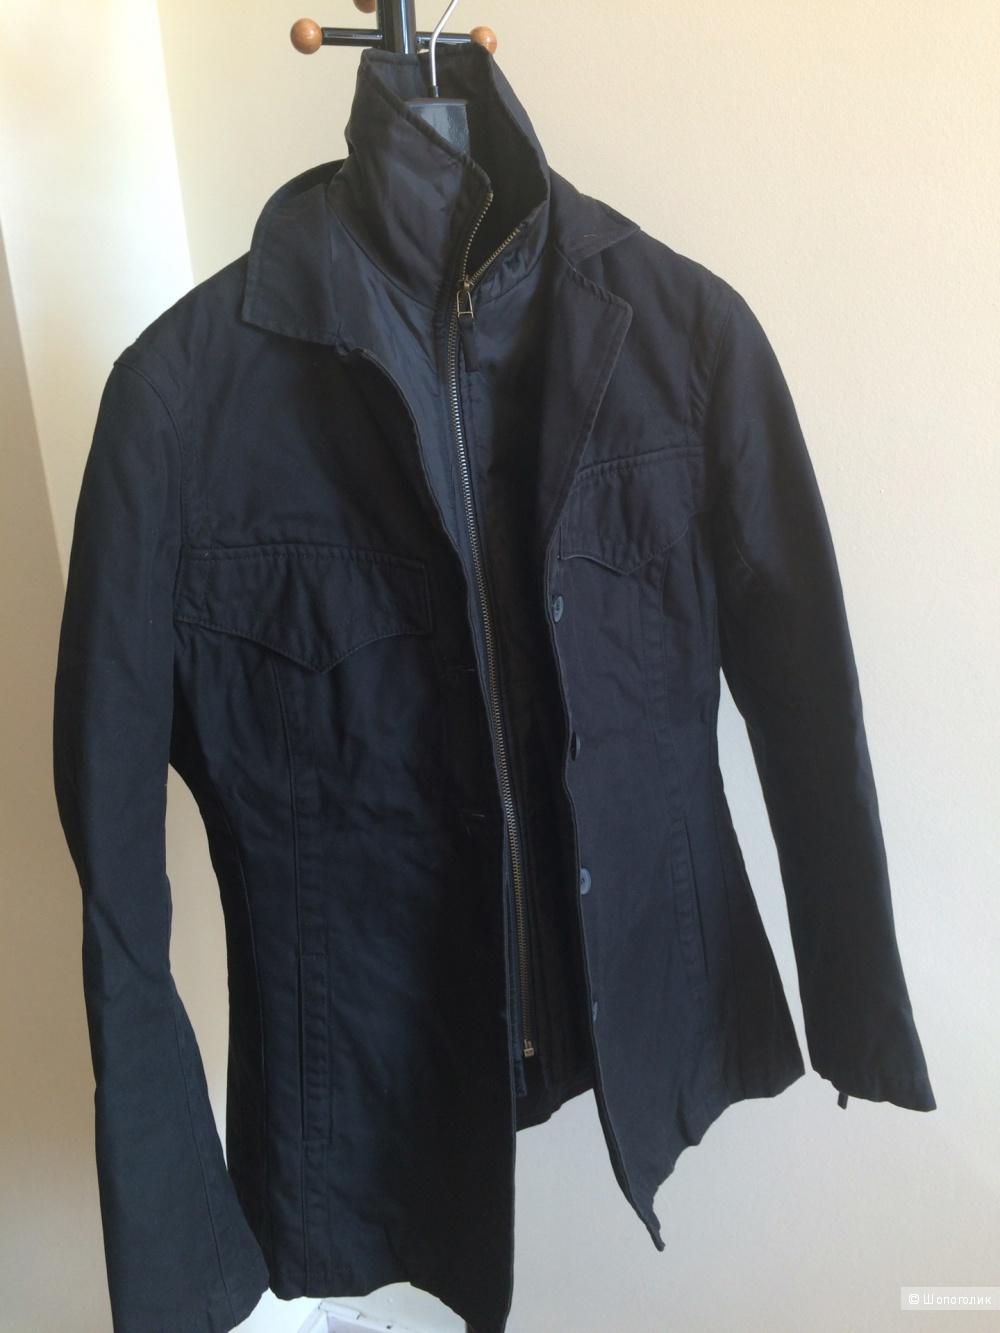 Куртка Massimo Dutti 2 в 1, размер М